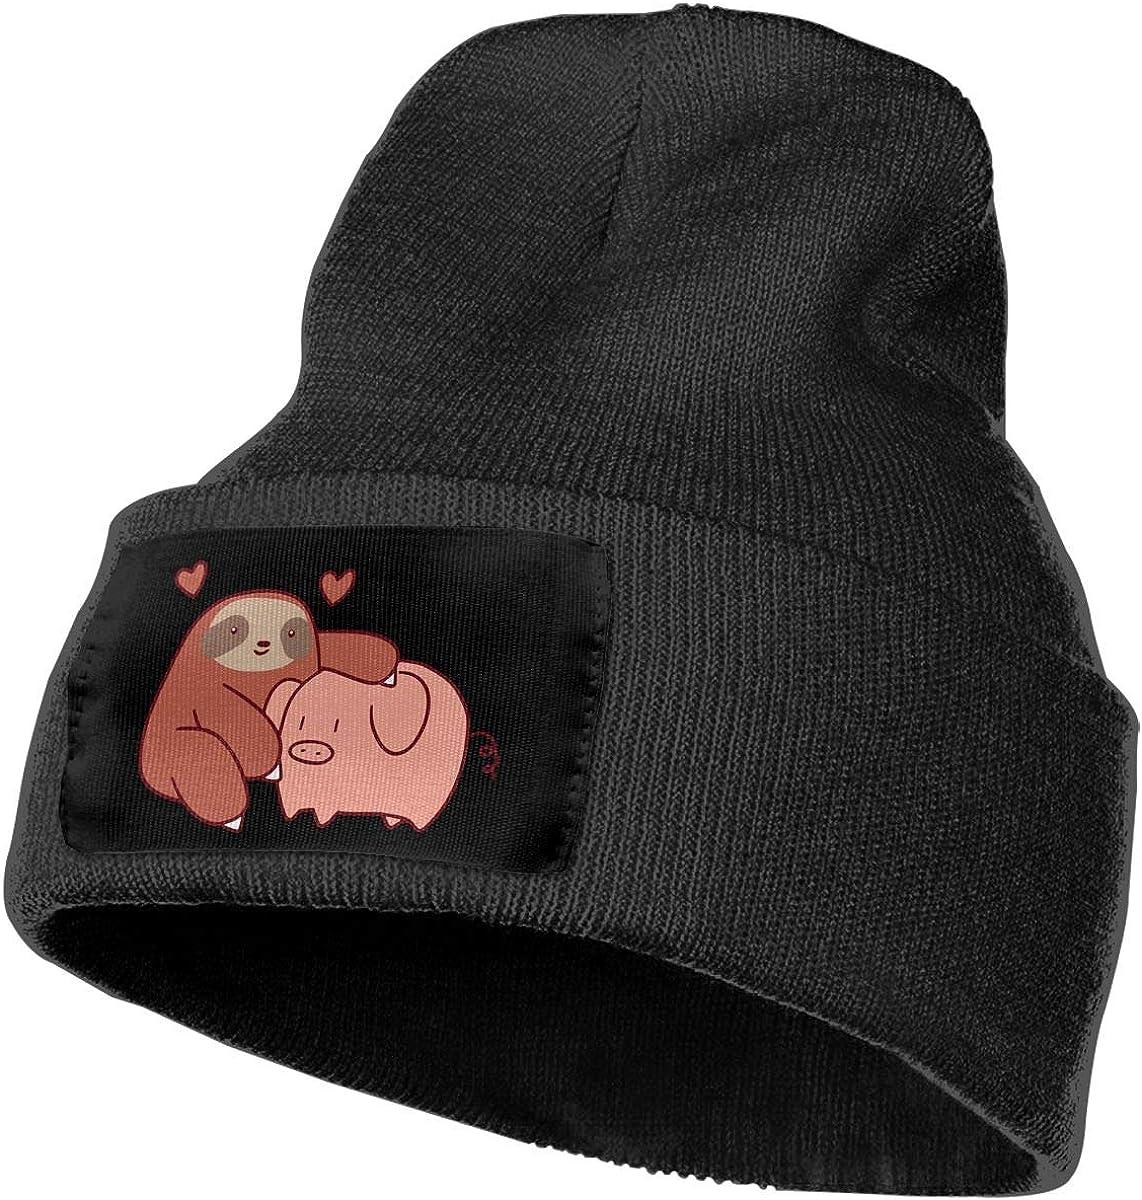 Men /& Women Sloth Loves Pig Outdoor Warm Knit Beanies Hat Soft Winter Skull Caps